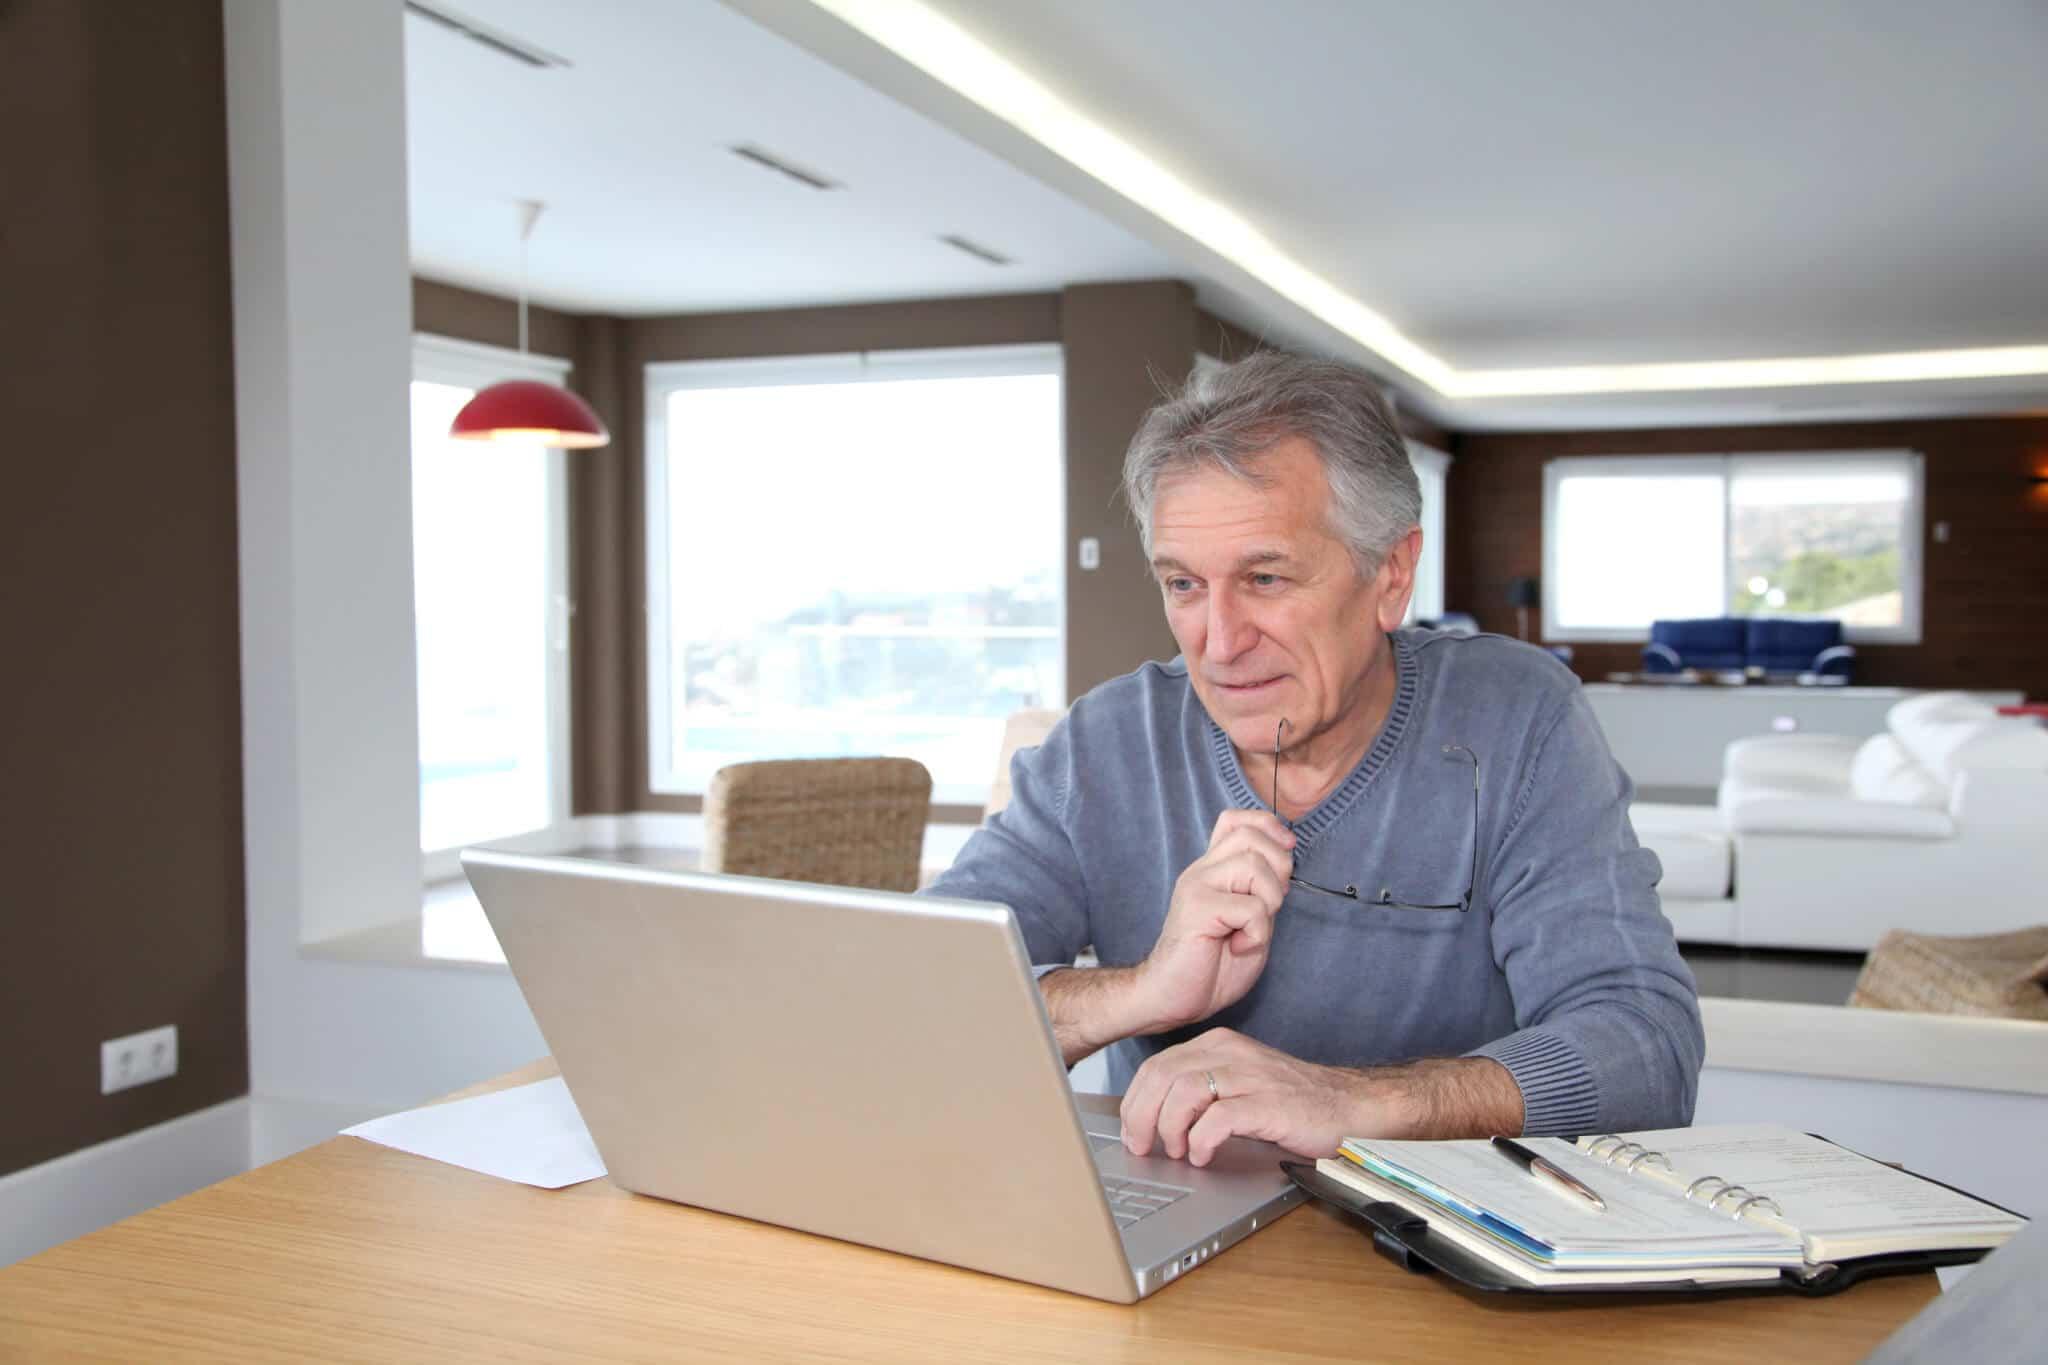 Do cybercriminals value personal data?